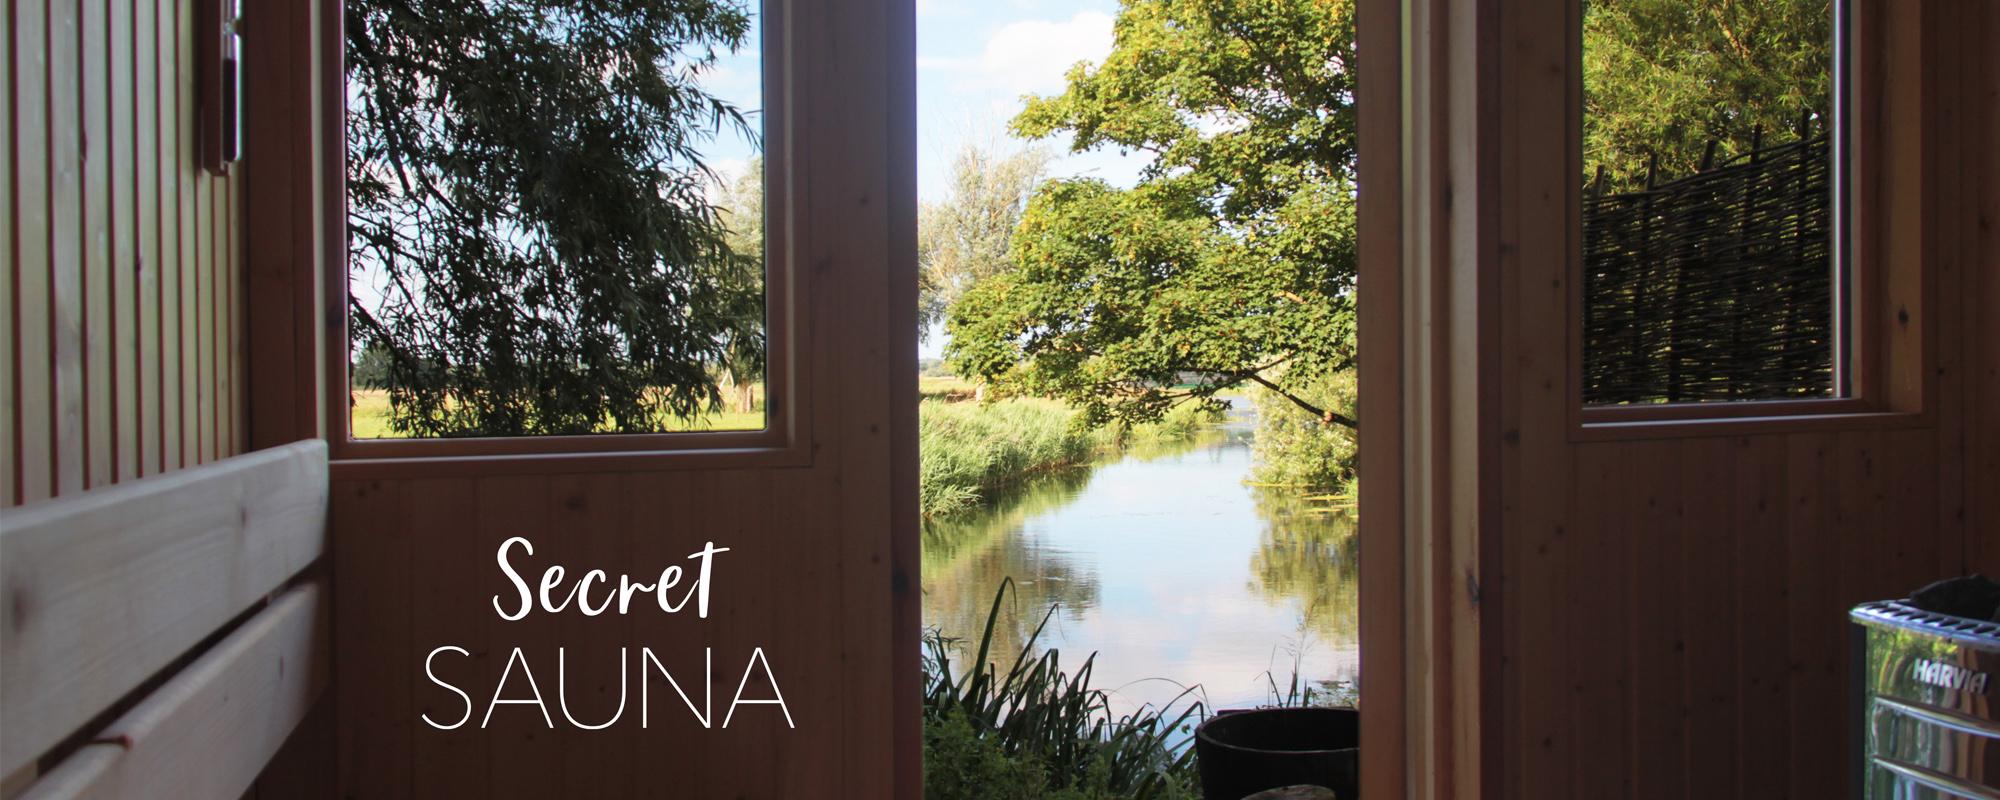 Secret Sauna - Wainford